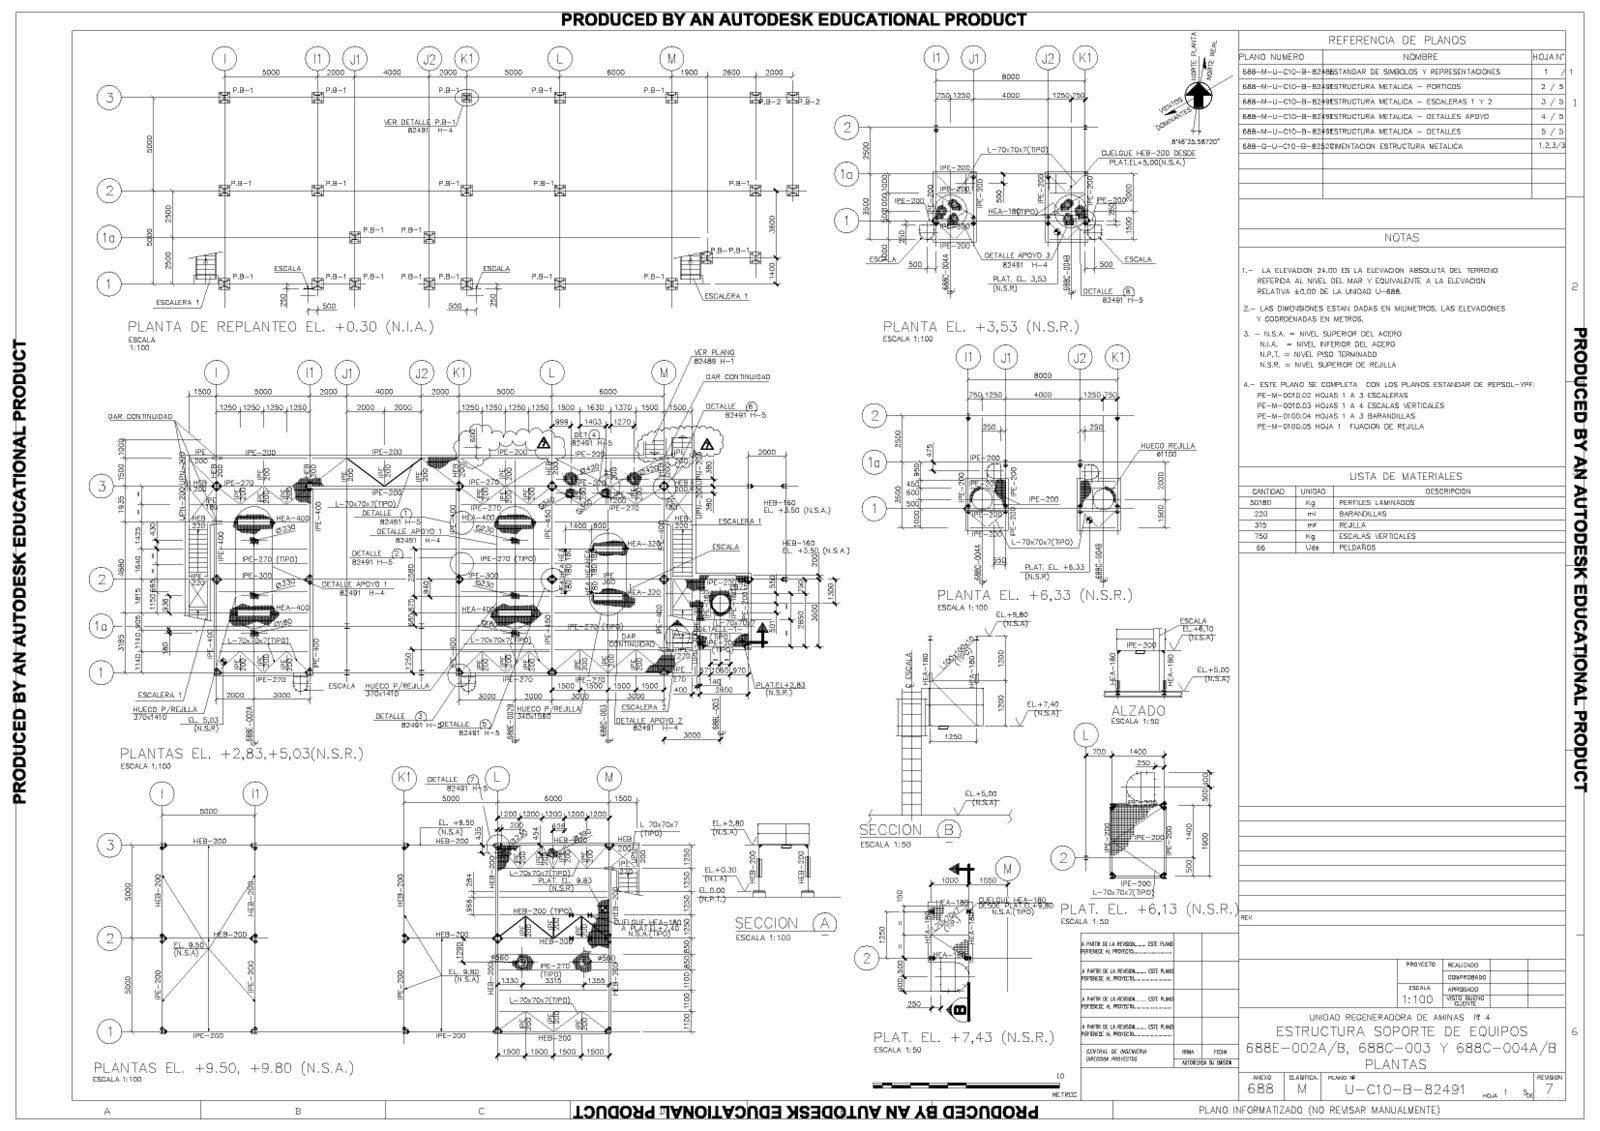 nfpa 20 handbook pdf